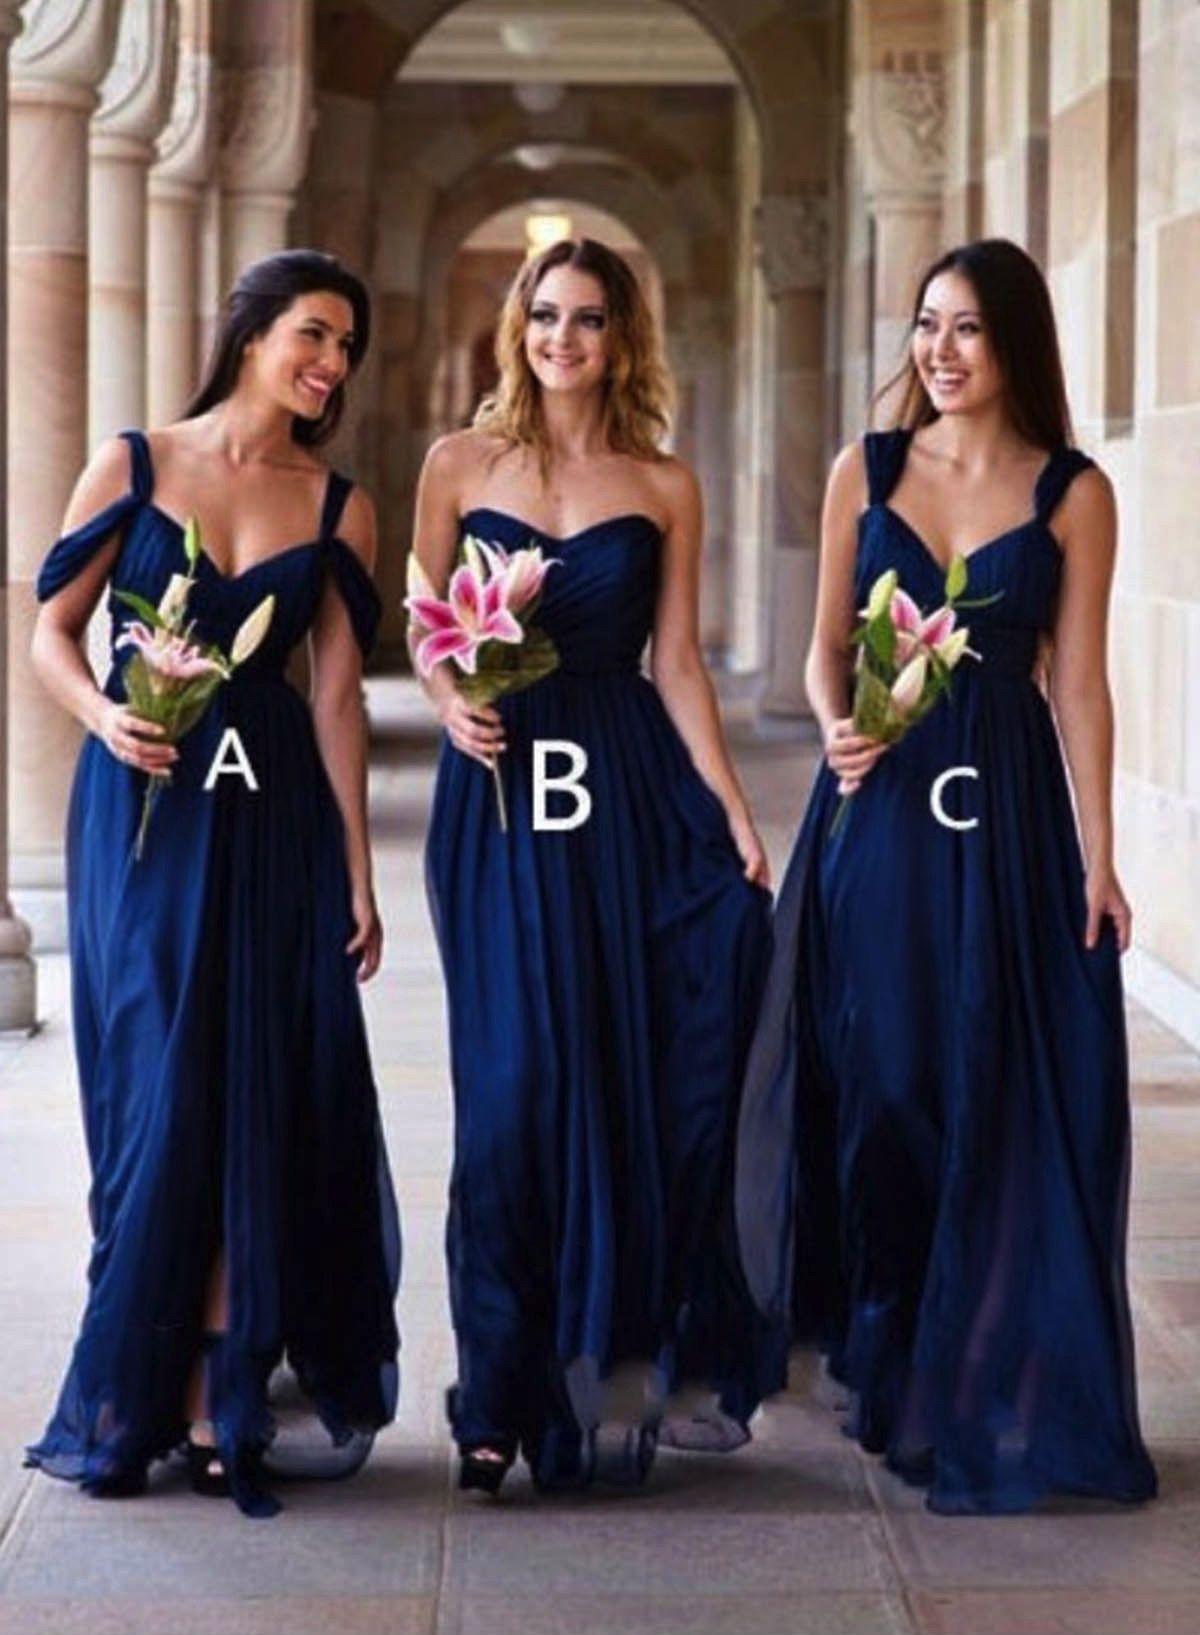 Navy blue chiffon simple long bridesmaid dresses promdress gowns